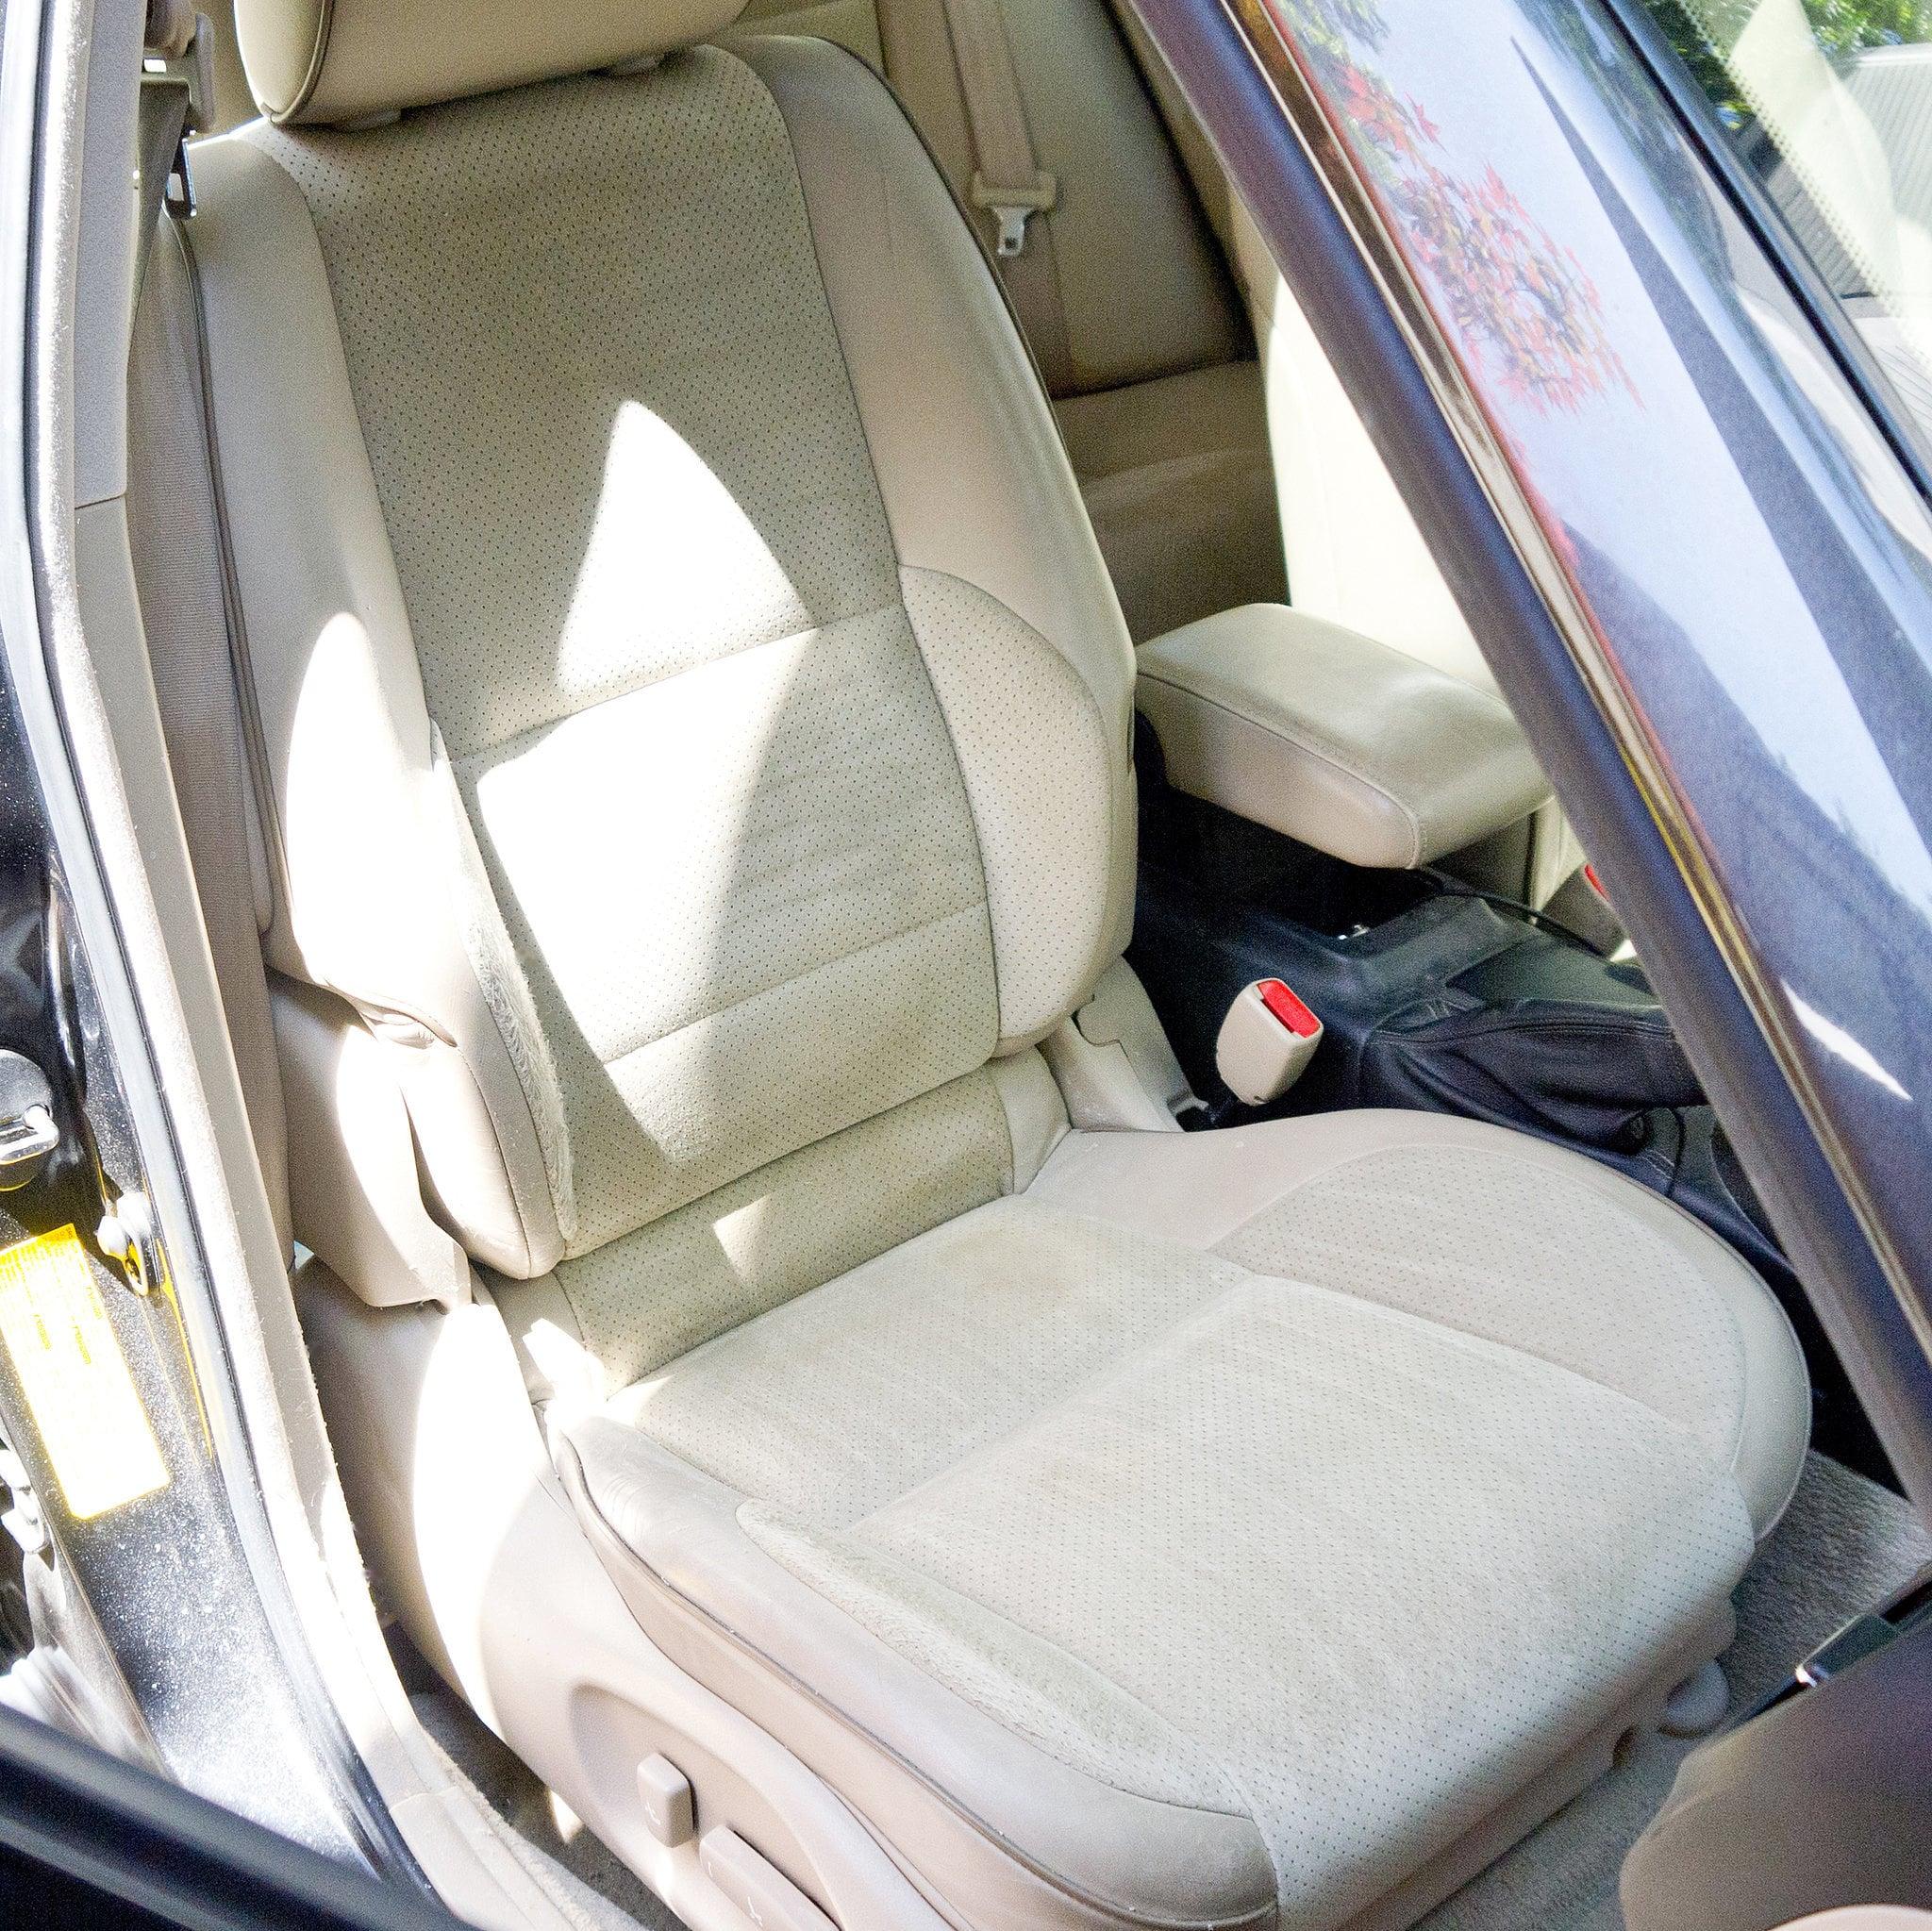 Car Seat Cleaner